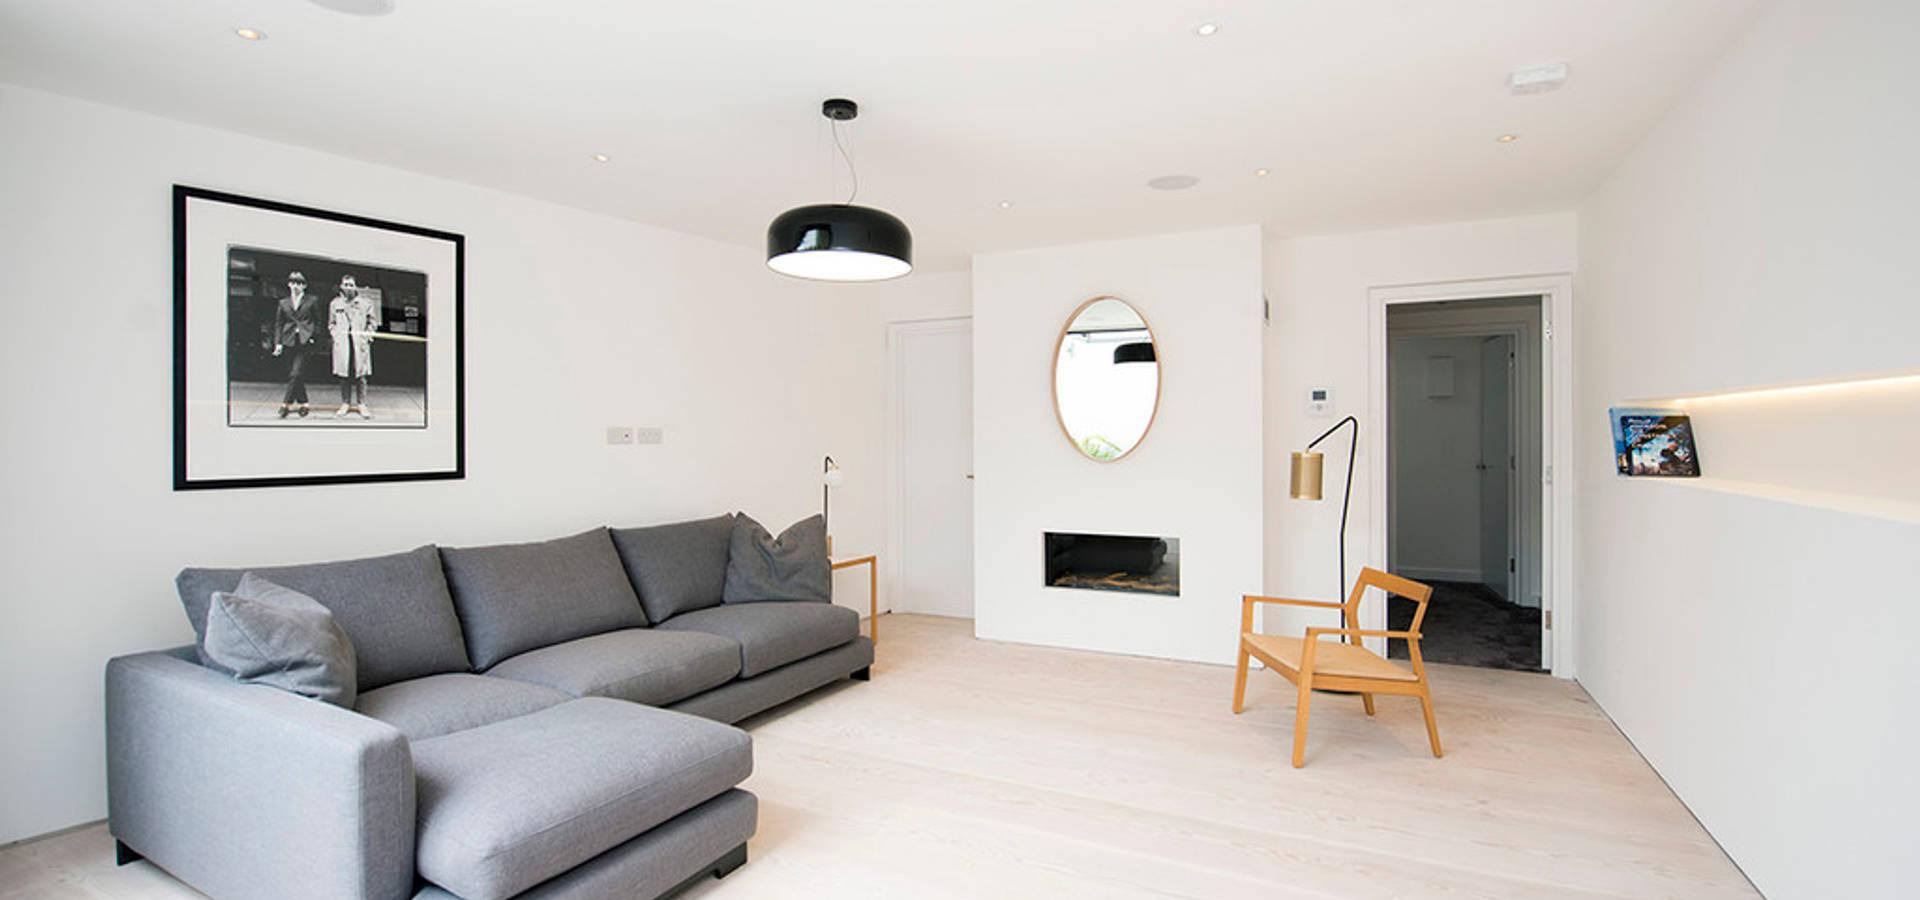 GPAD Architecture & Interior Design